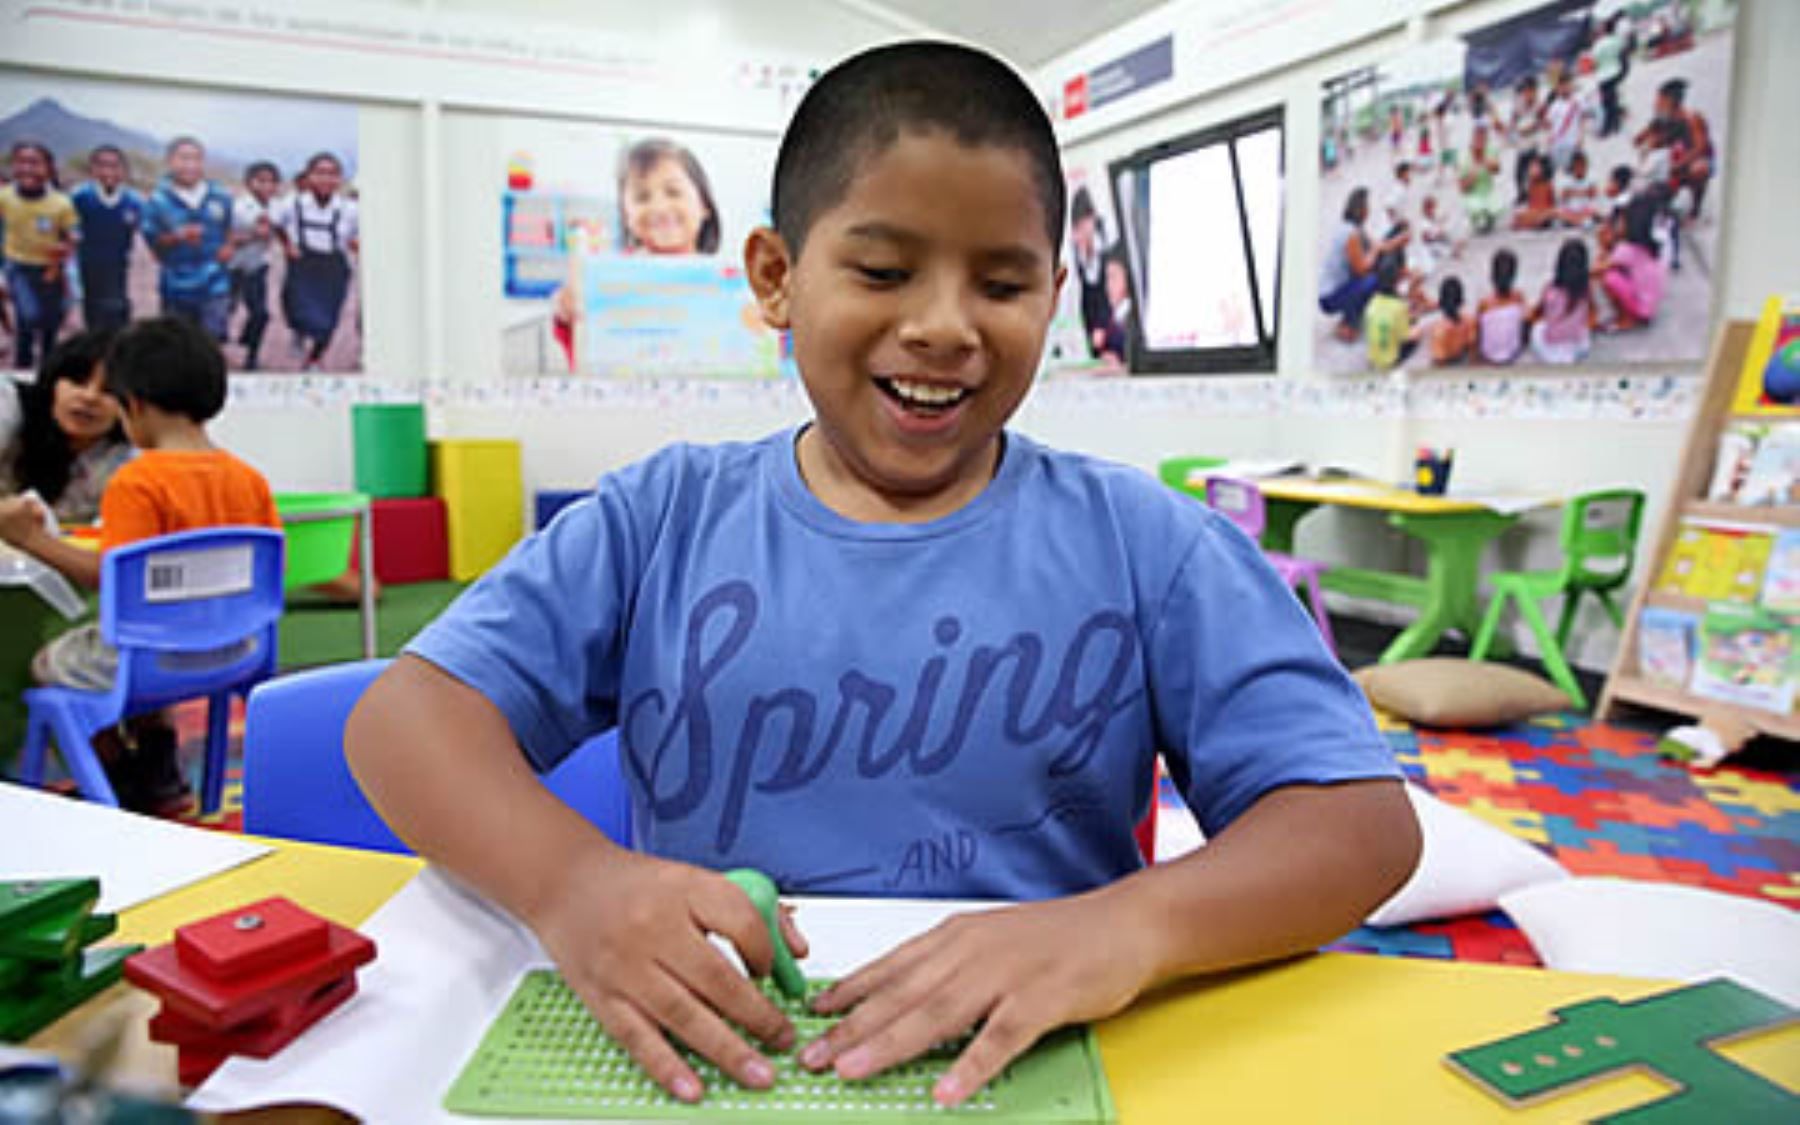 Capacitan a docentes para garantizar aprendizaje de estudiantes con ceguera noticias agencia - Agencias para tener estudiantes en casa ...